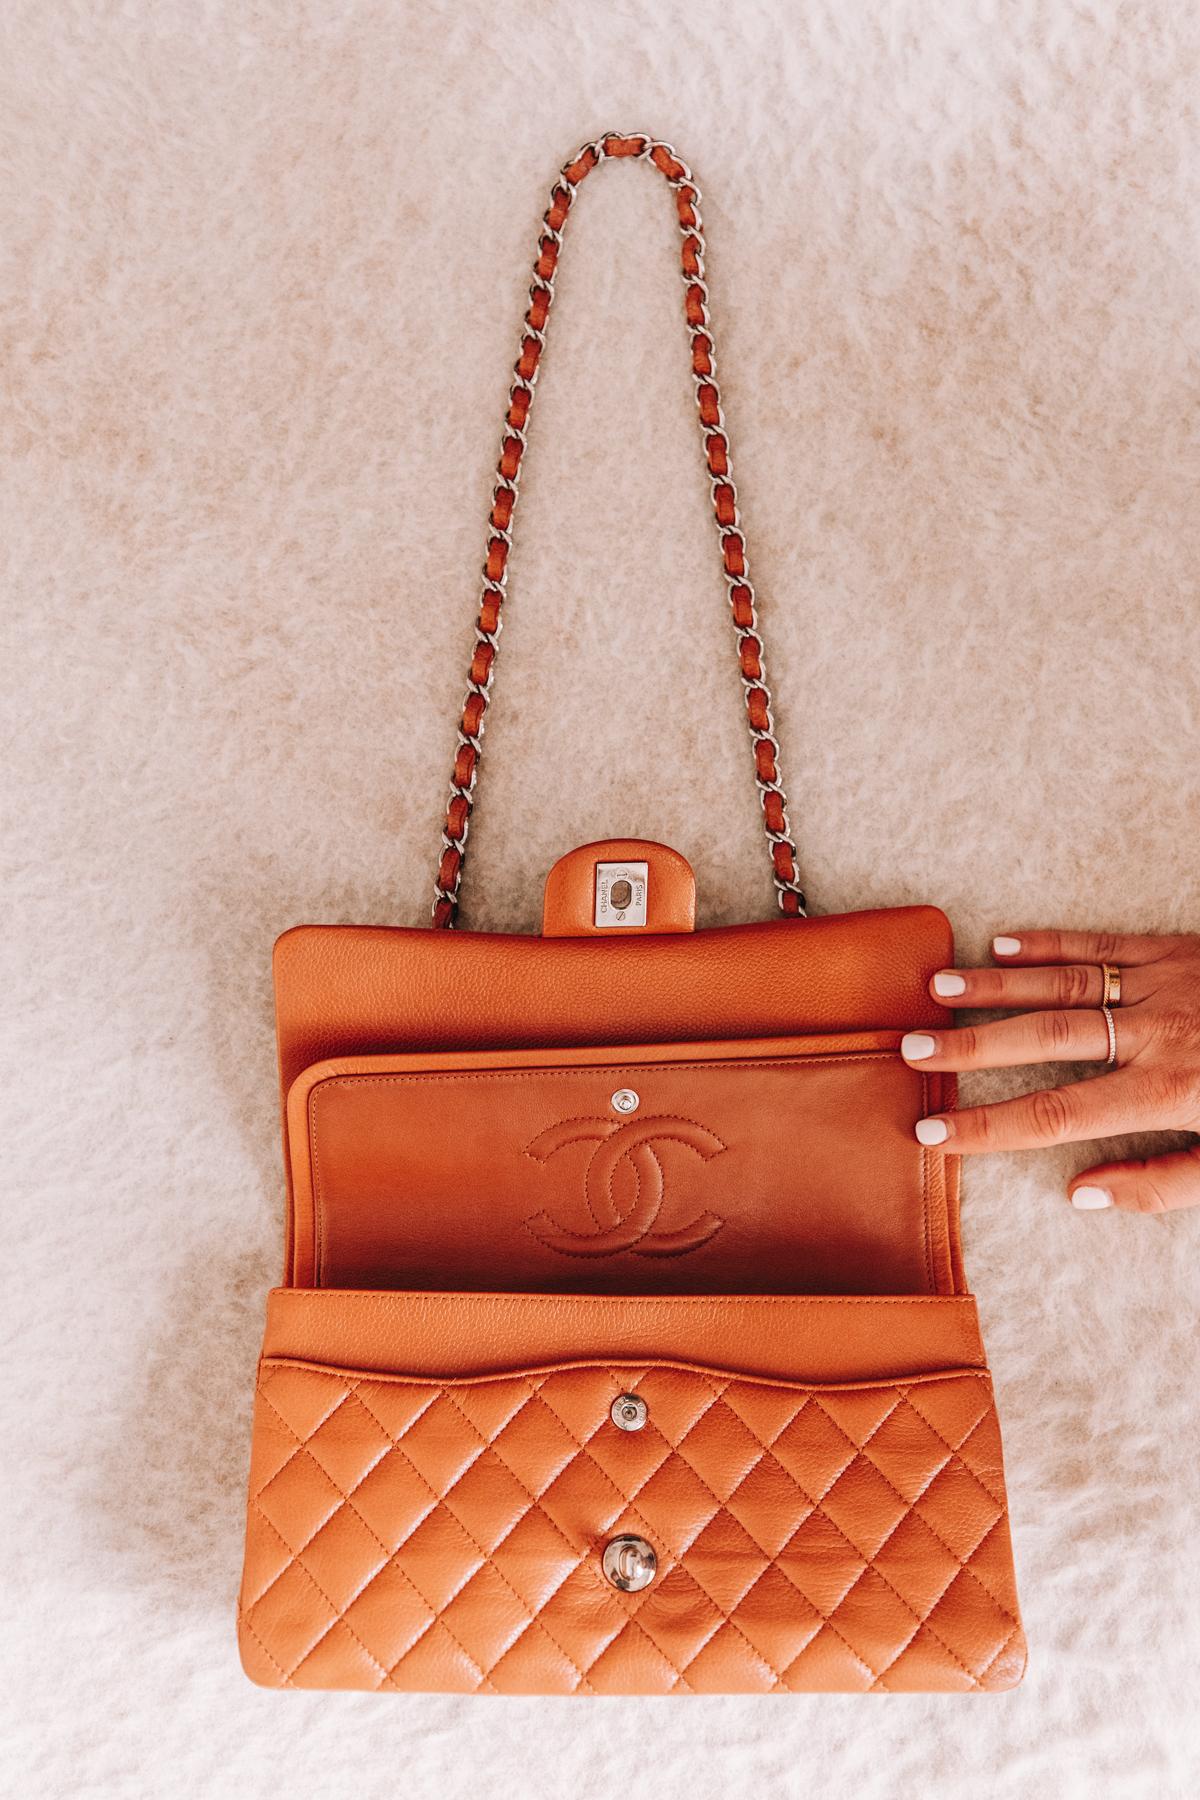 Fashion Jackson Chanel Classic Flap Medium Caramel Handbag with Silver Hardware 1